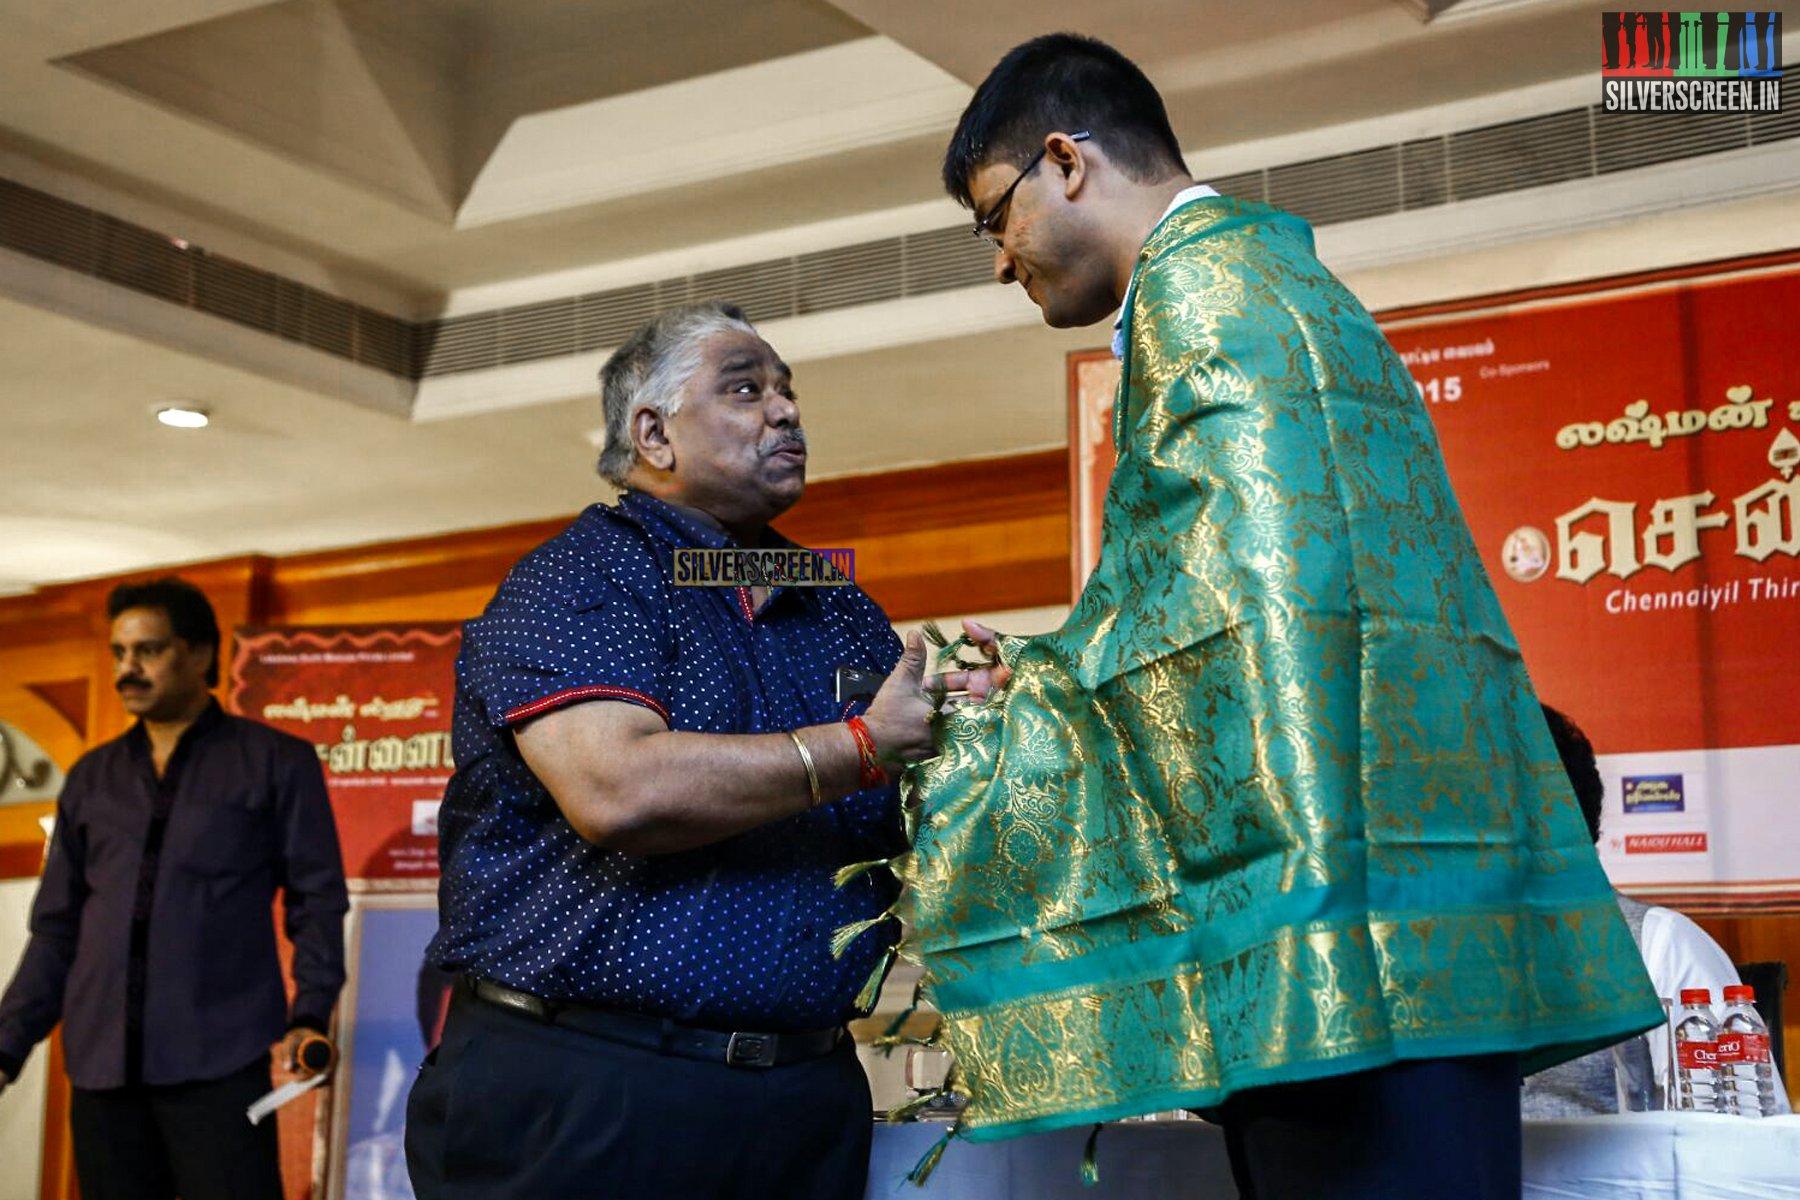 chennaiyil thiruvaiyaru 2015 press meet the